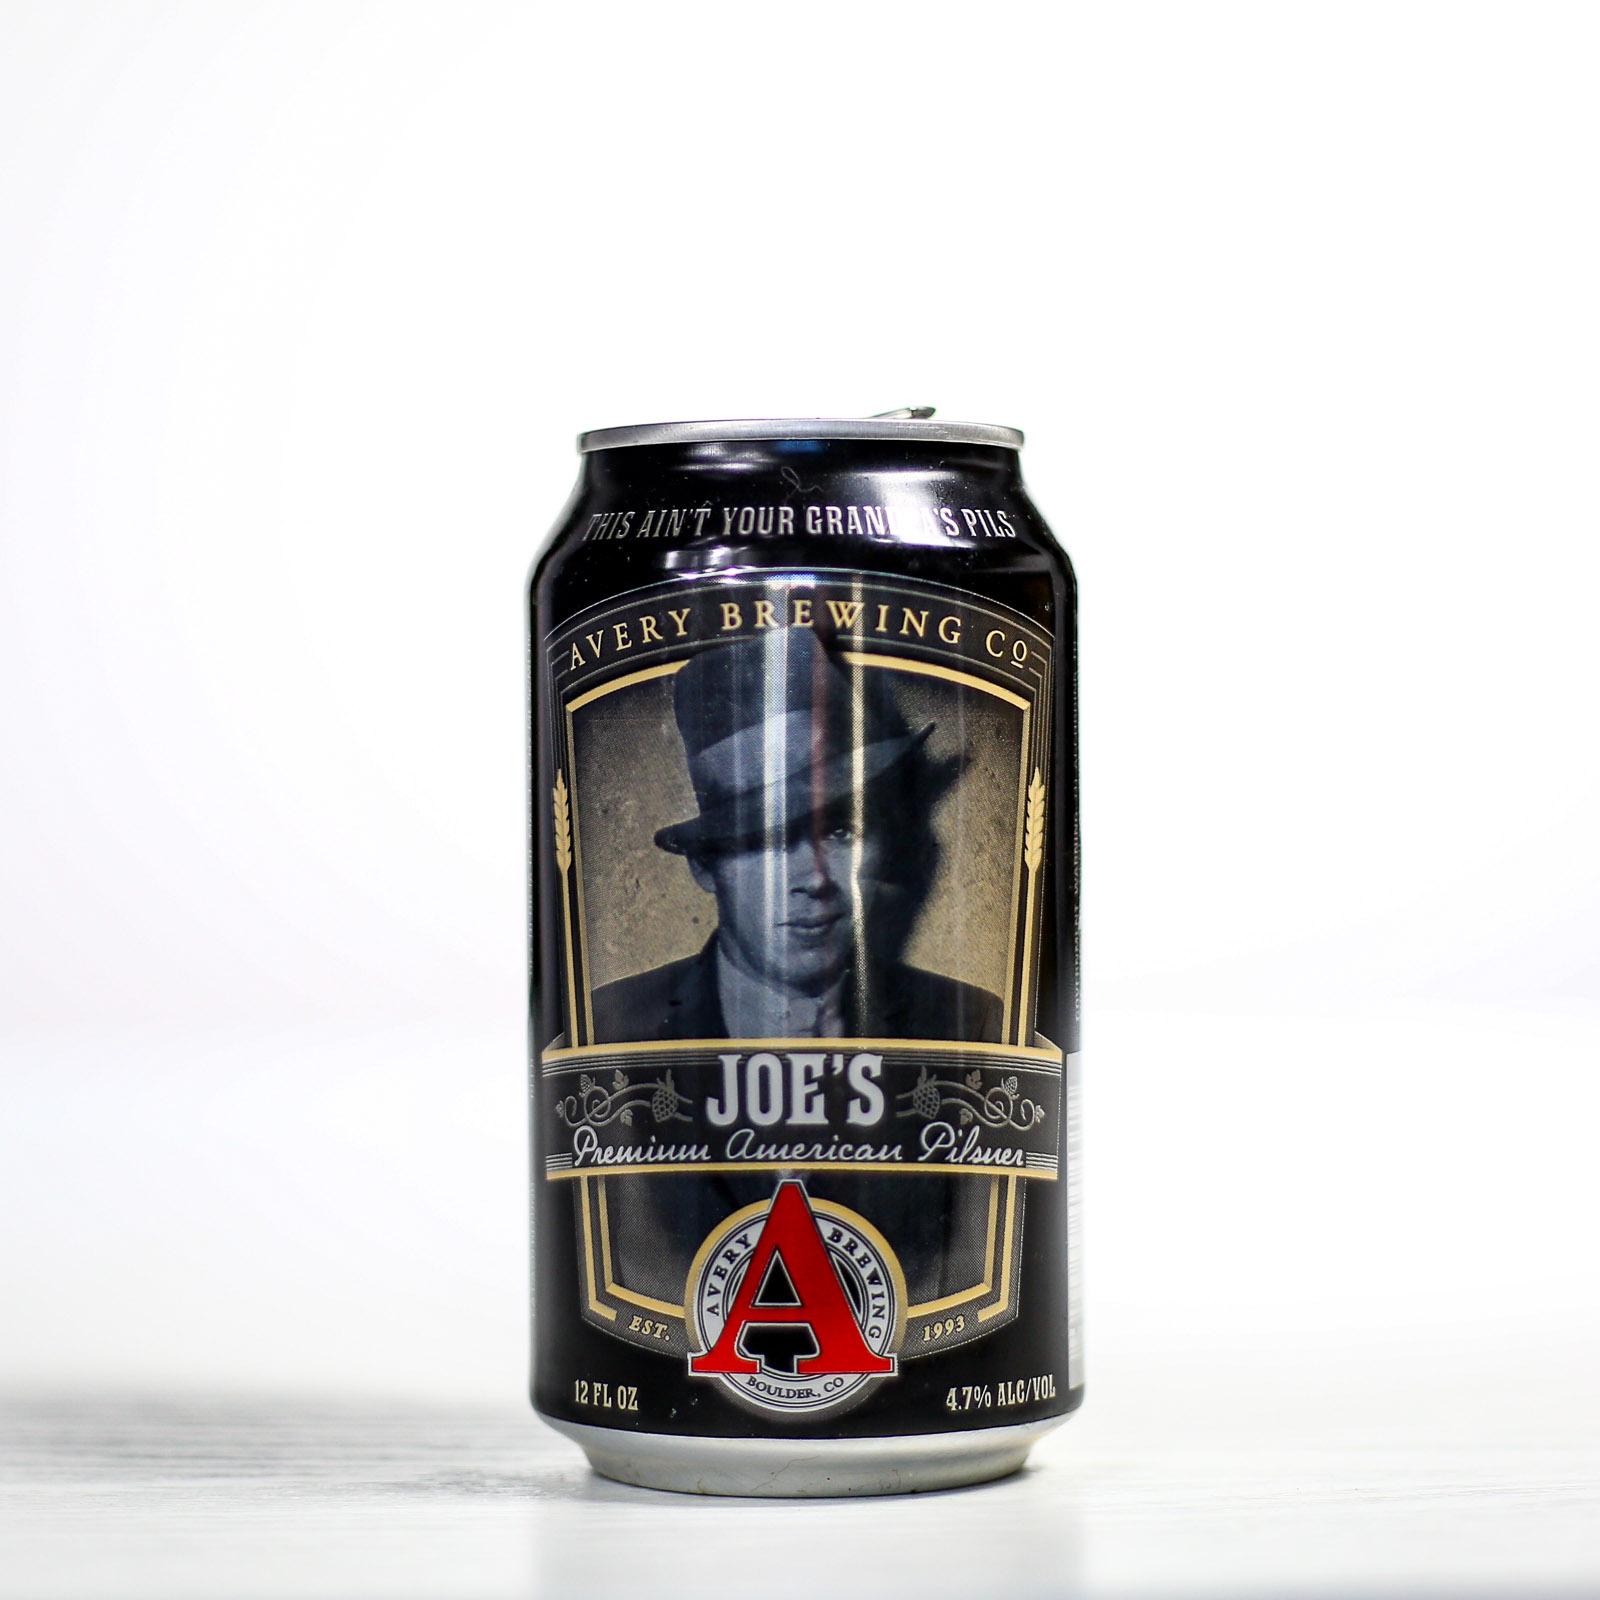 Avery Brewing Co. - Joe's Premium American Pilsner